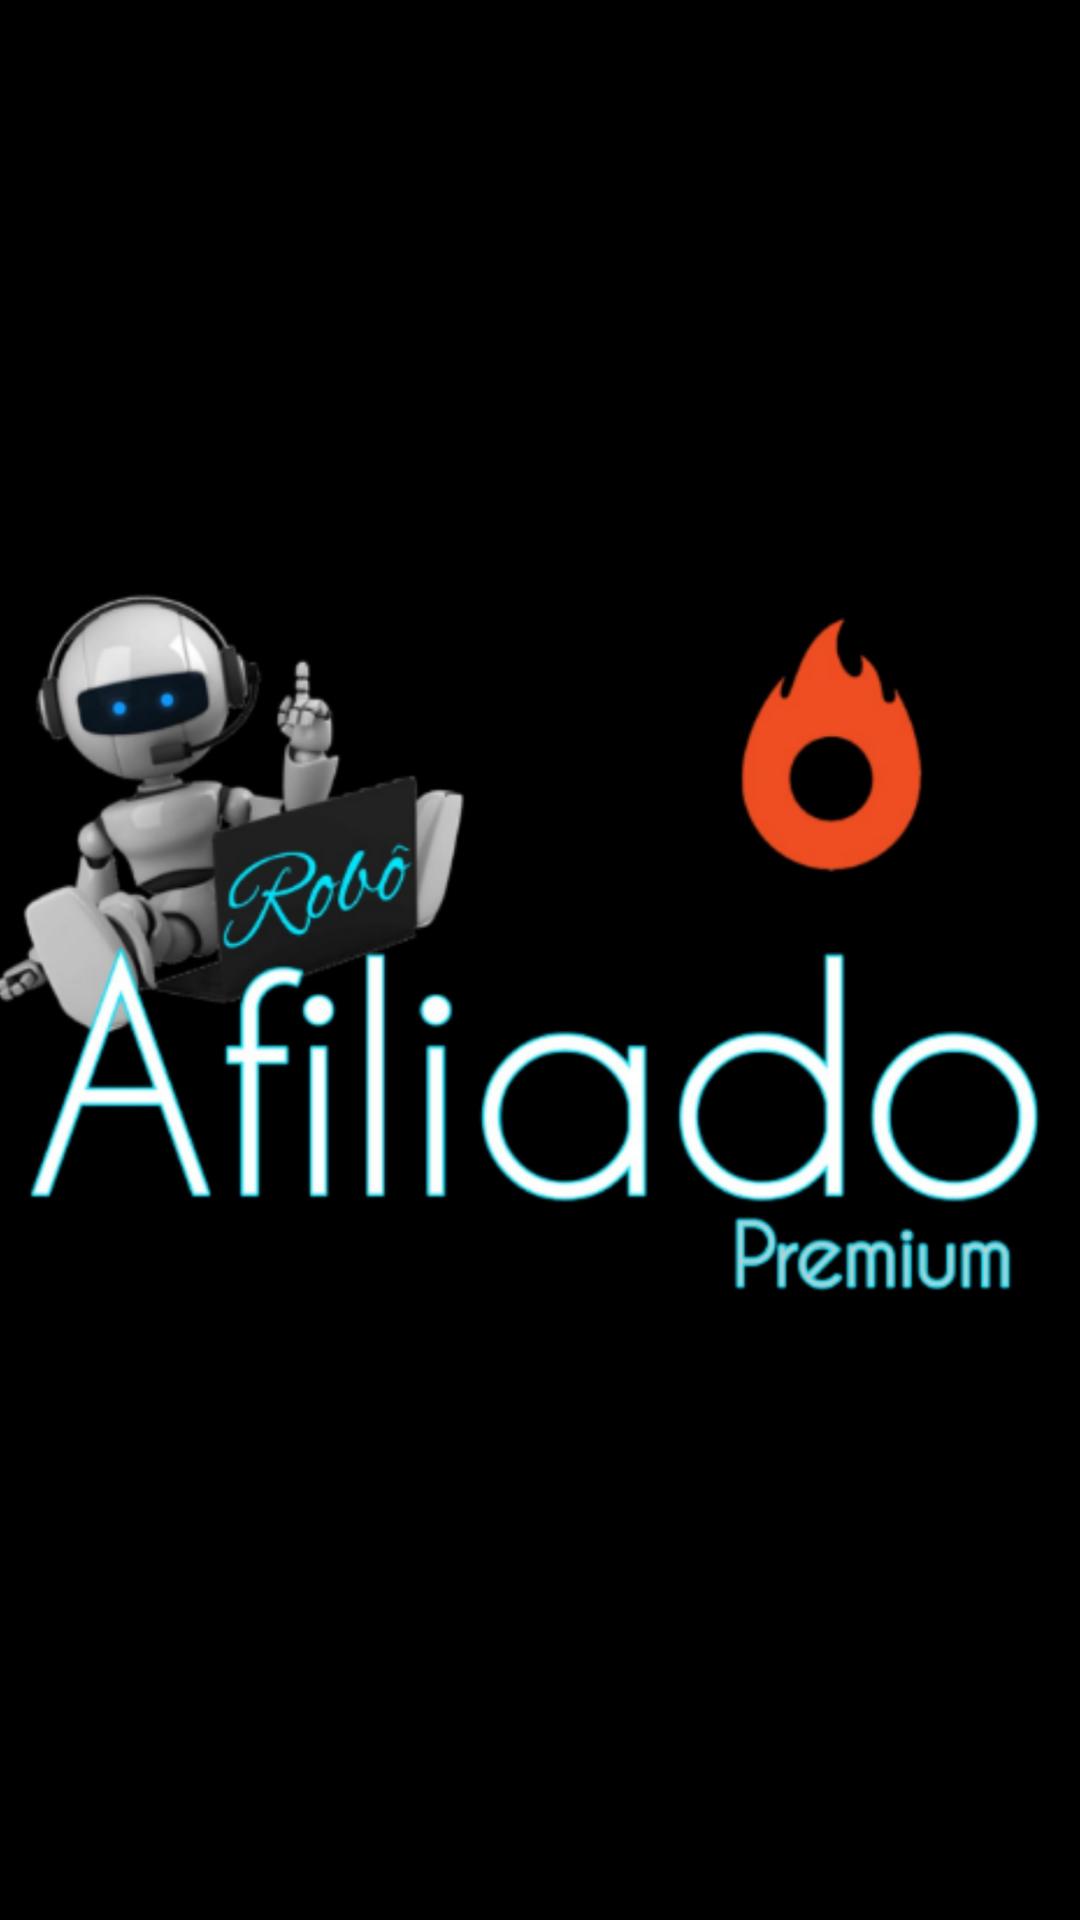 Robô afiliado Premium